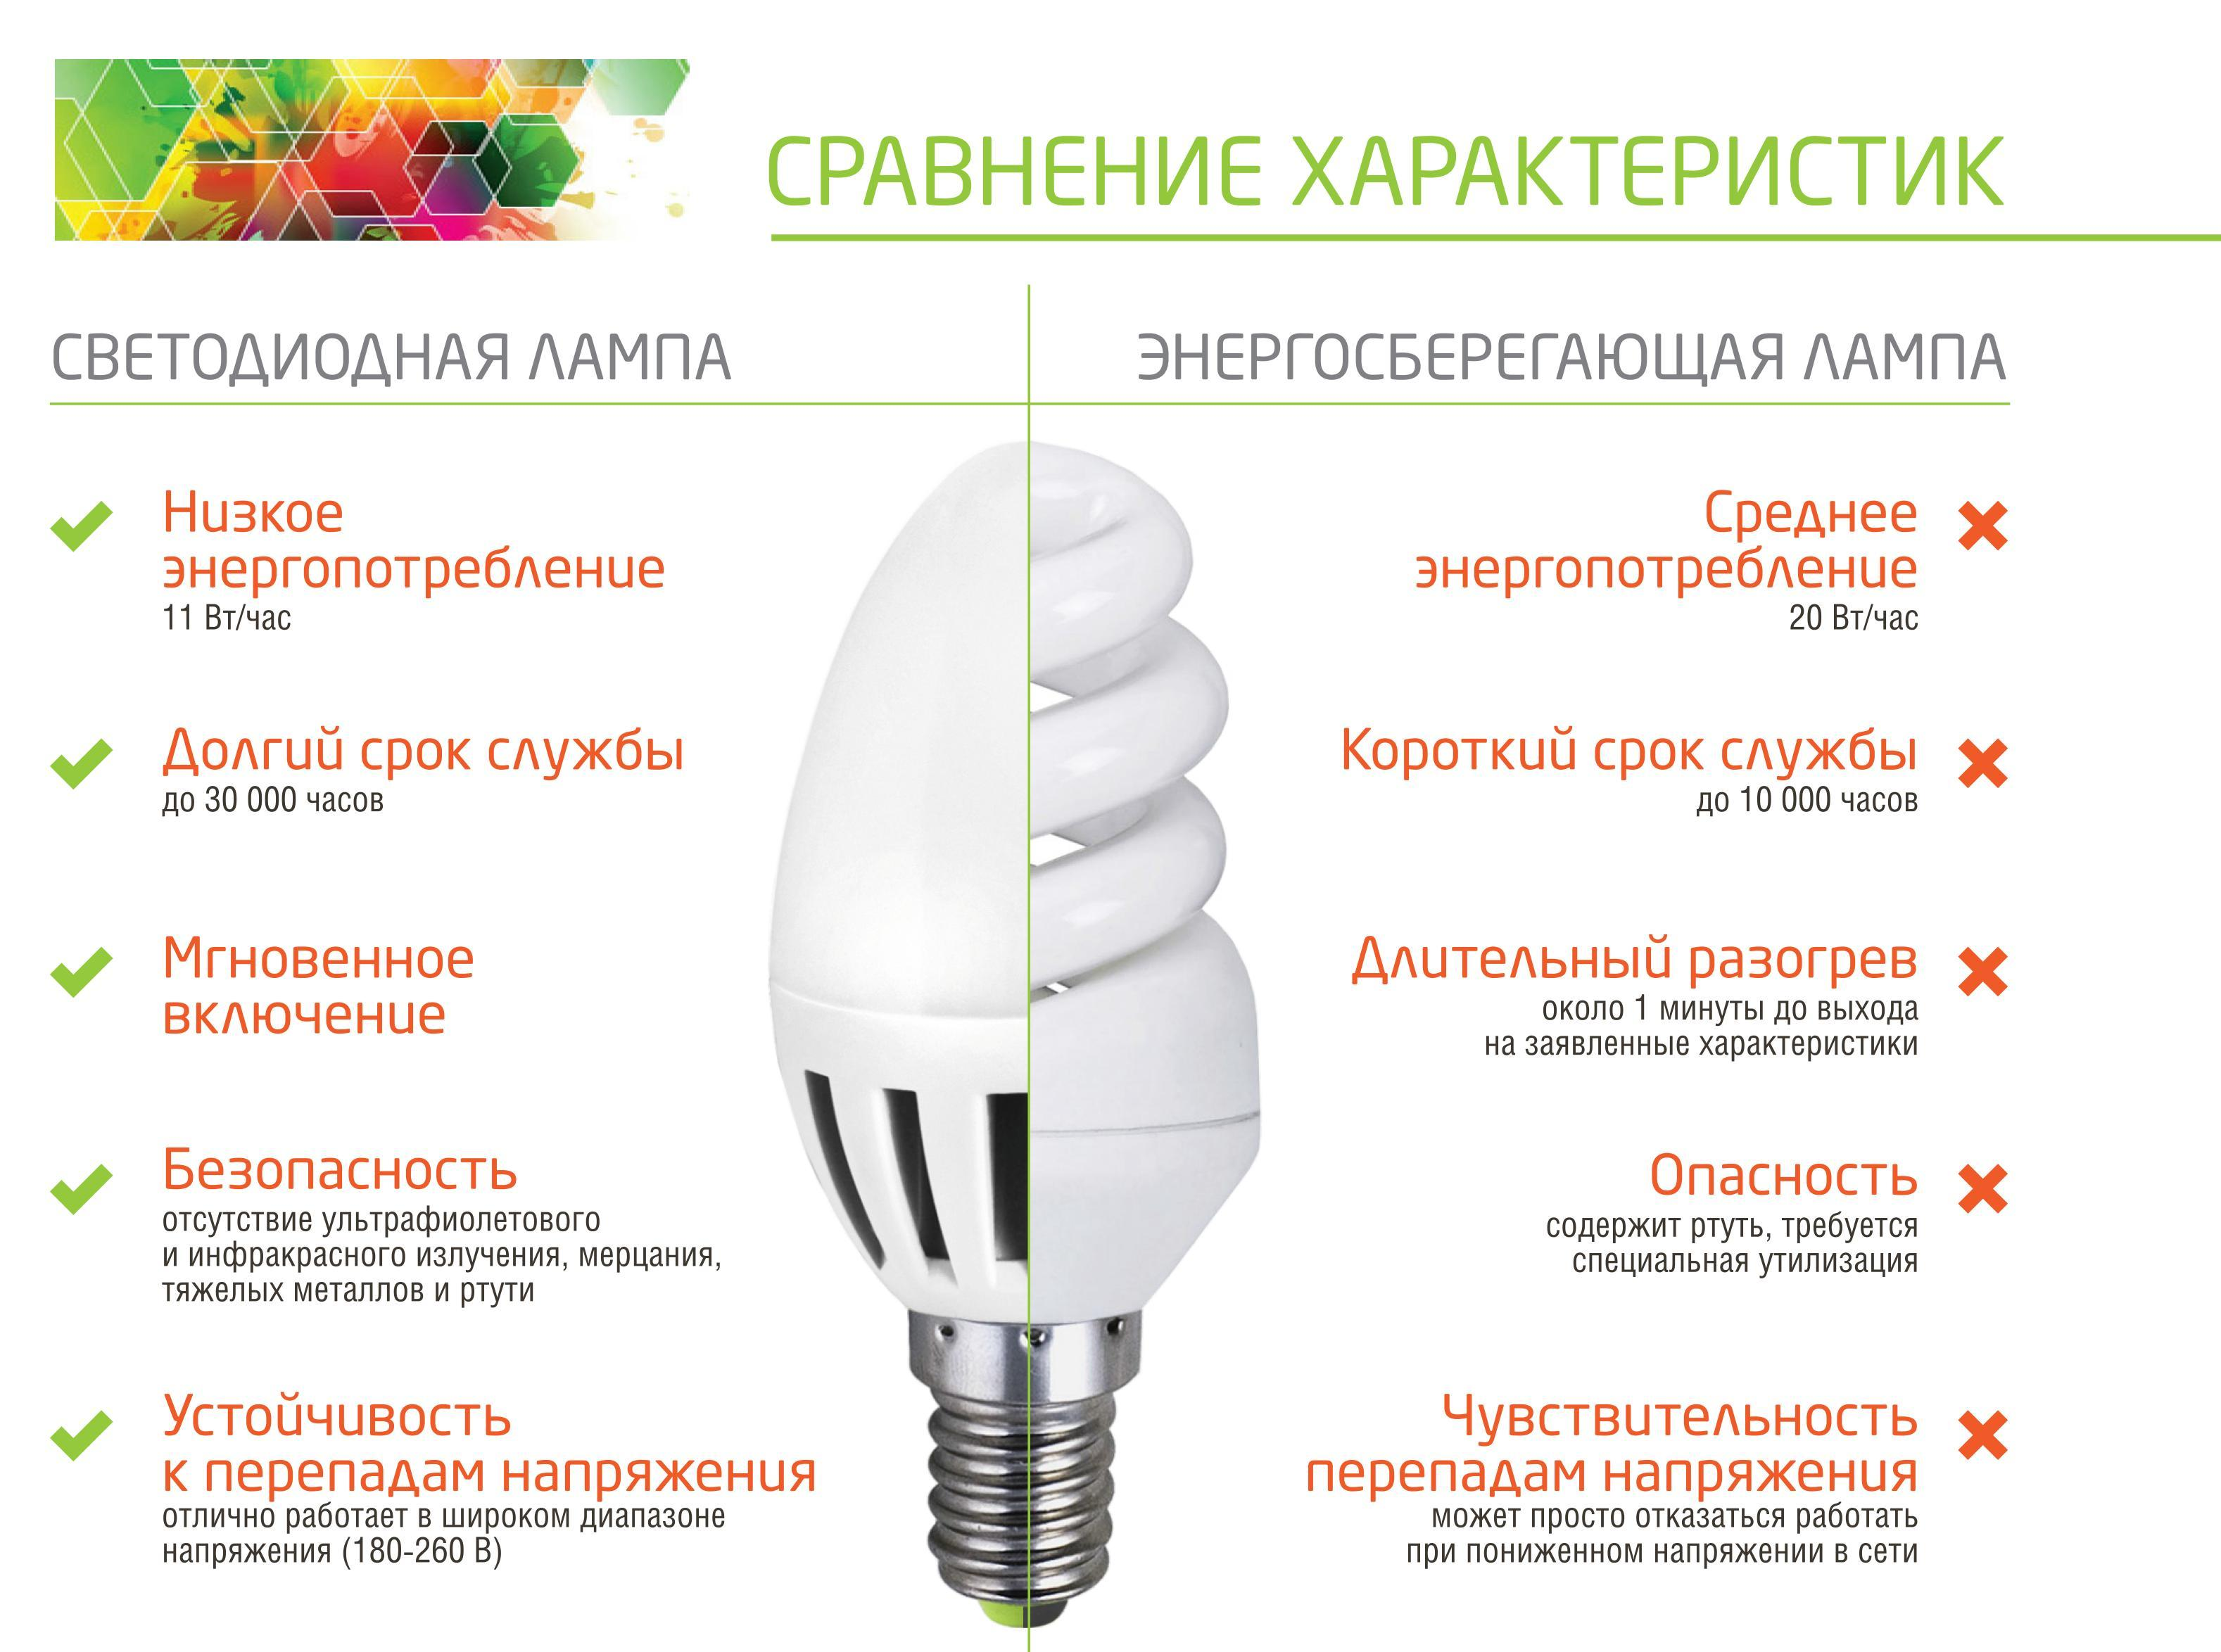 Преимущества использования LED ламп